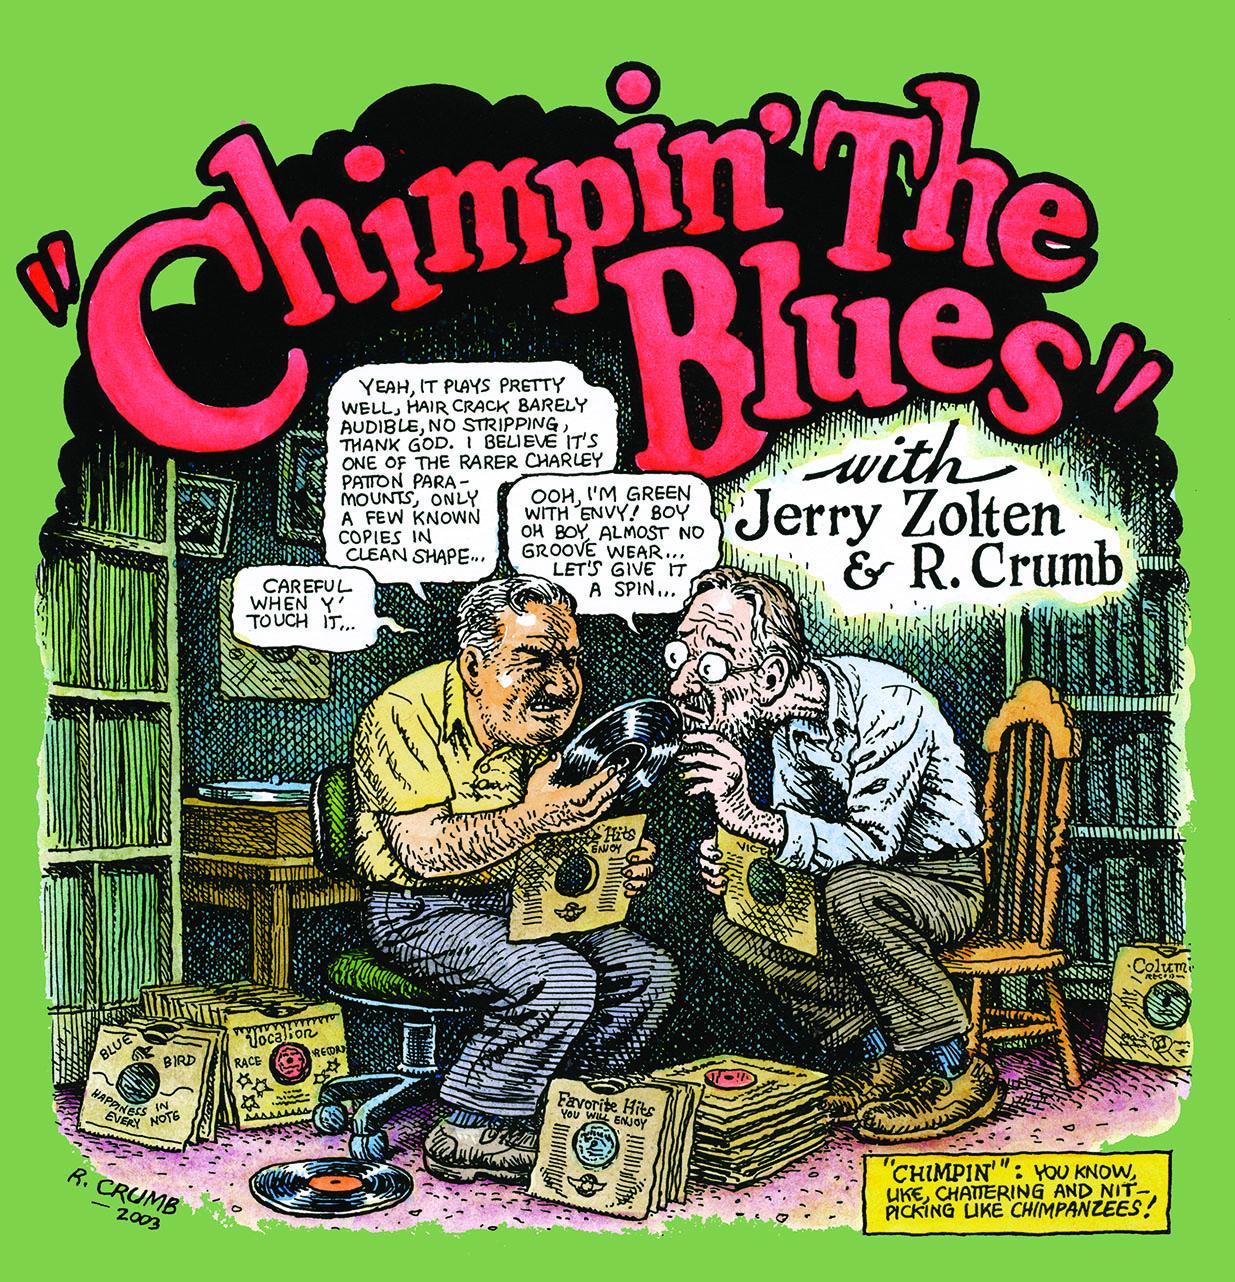 chimpin the blues R. Crumb john heneghan eden brower east river string band